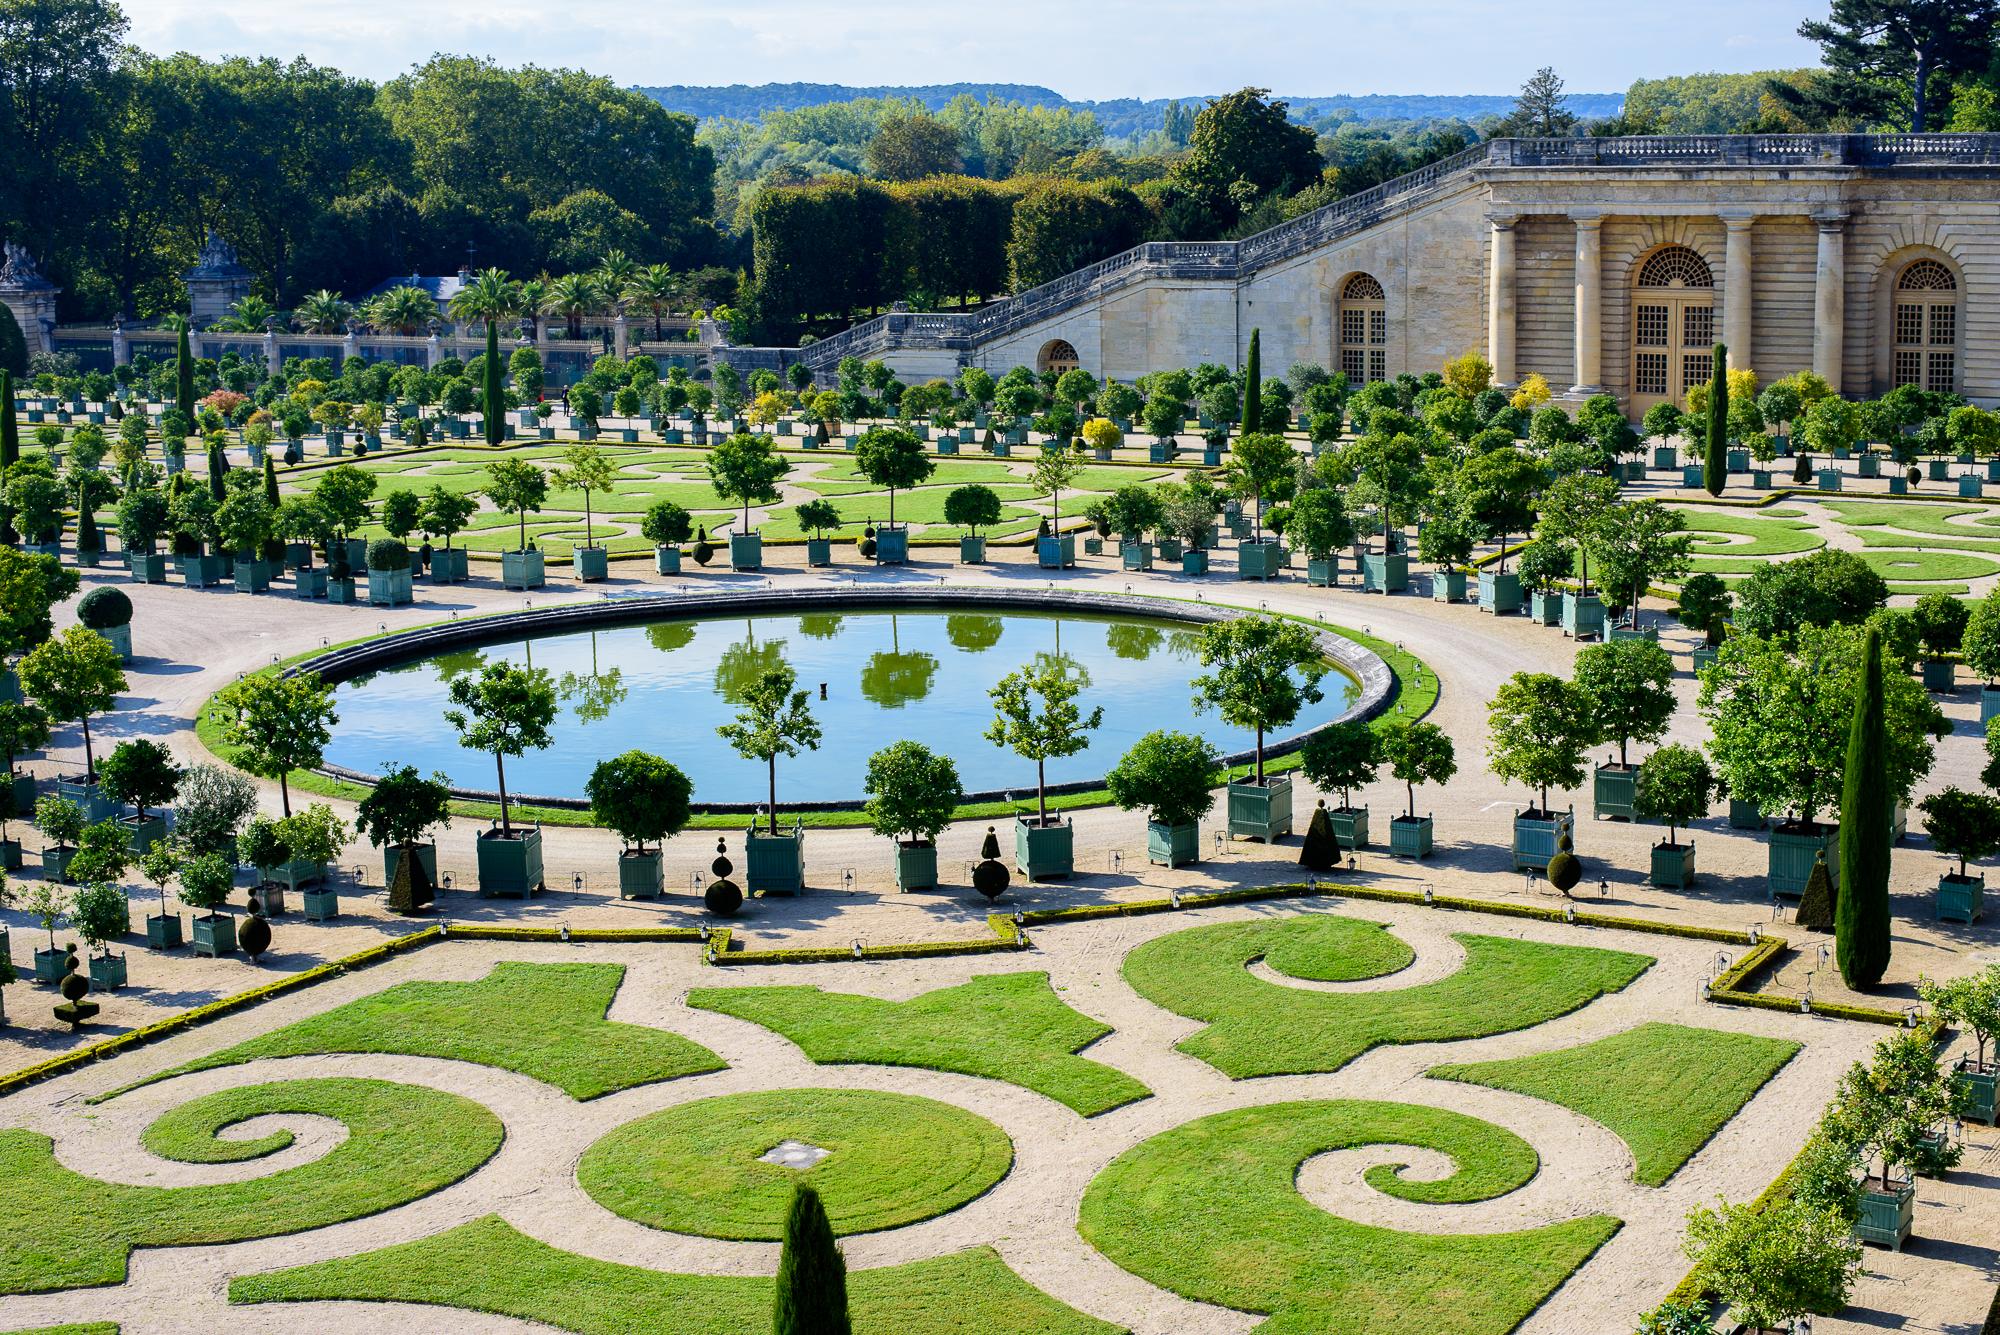 palace-of-versailles-garden-9